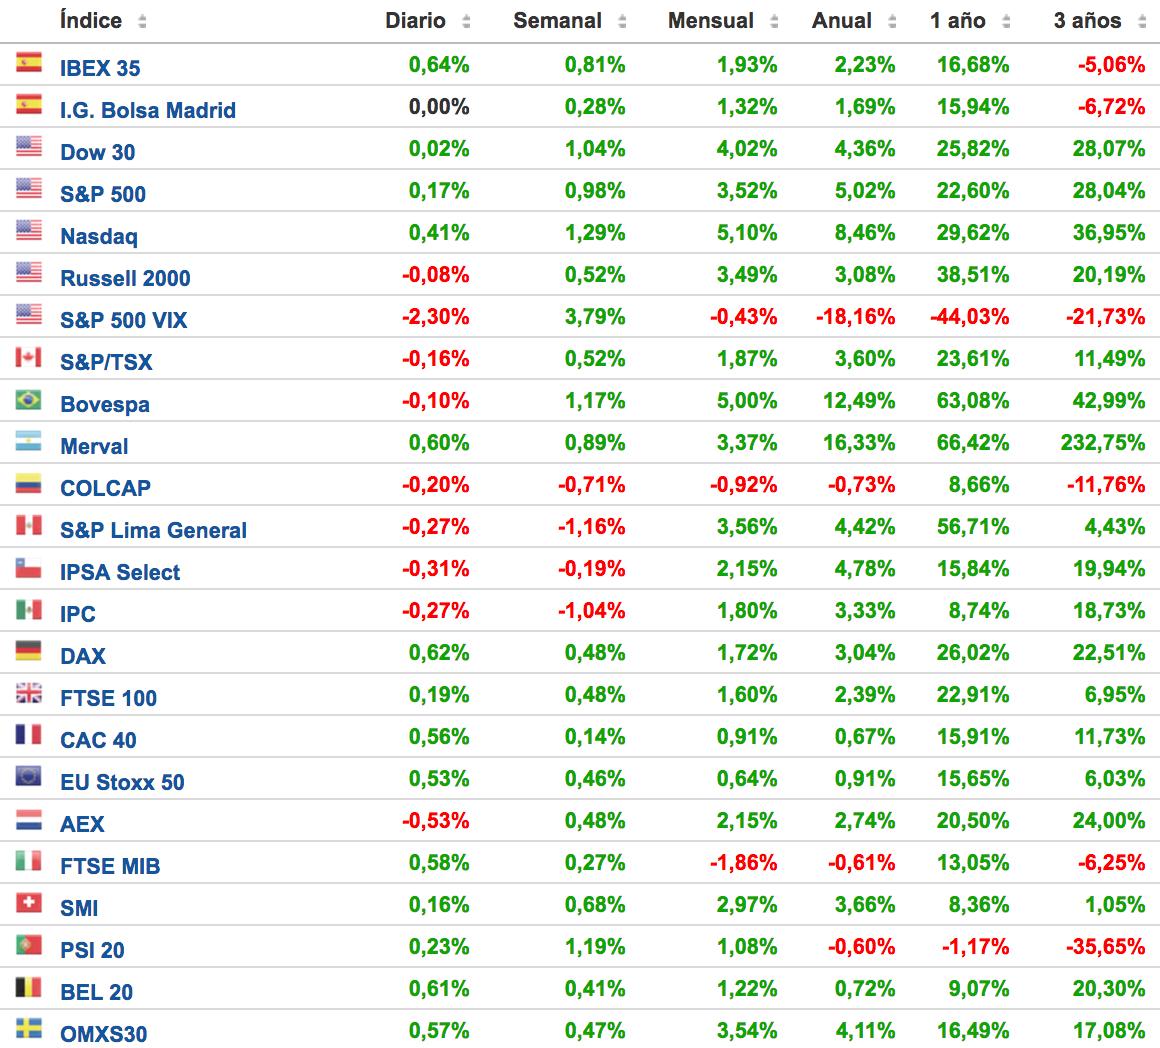 rentabilidades principales índices bursátiles Altair Finance